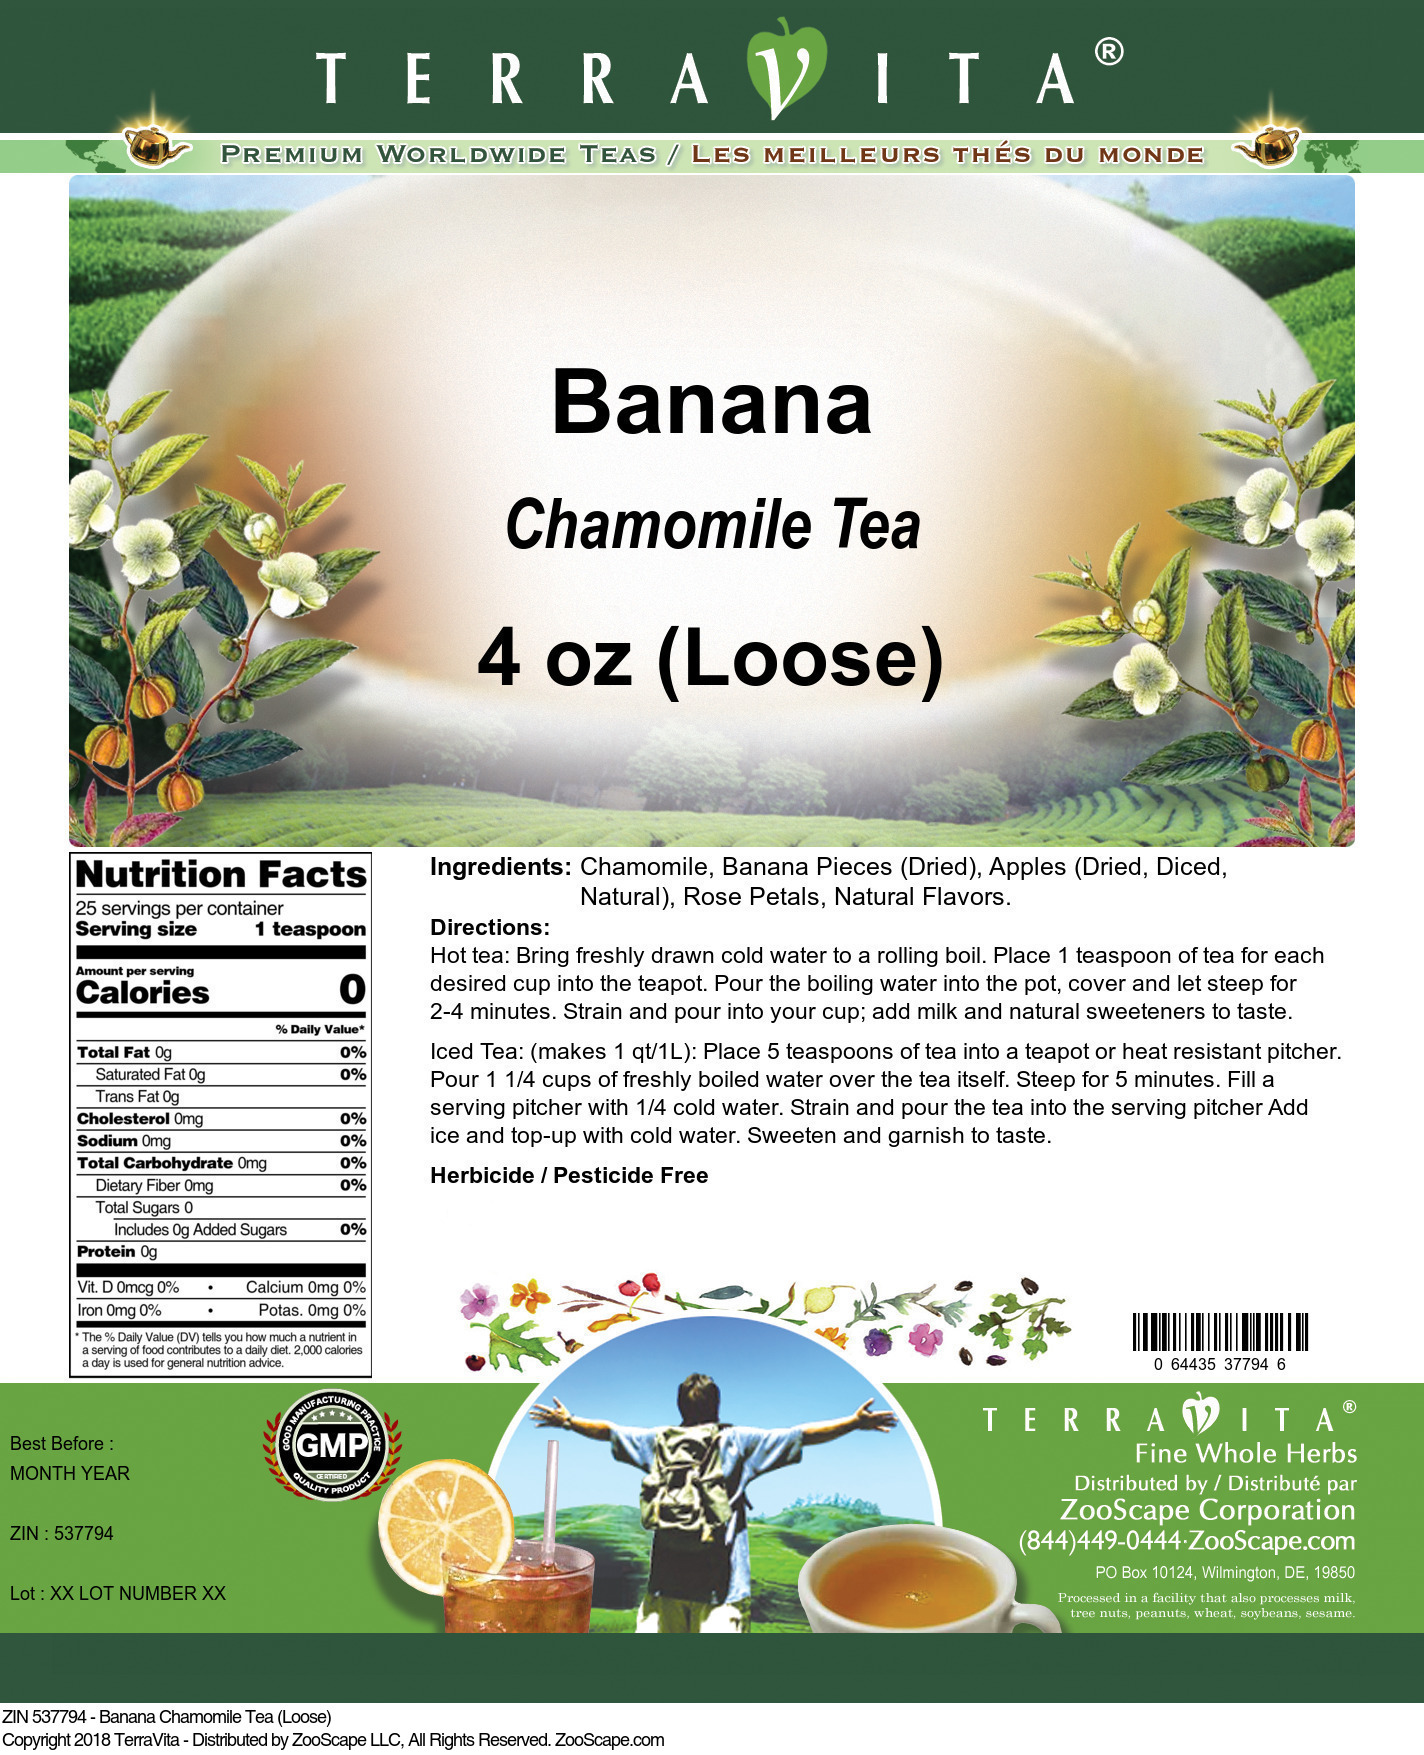 Banana Chamomile Tea (Loose)